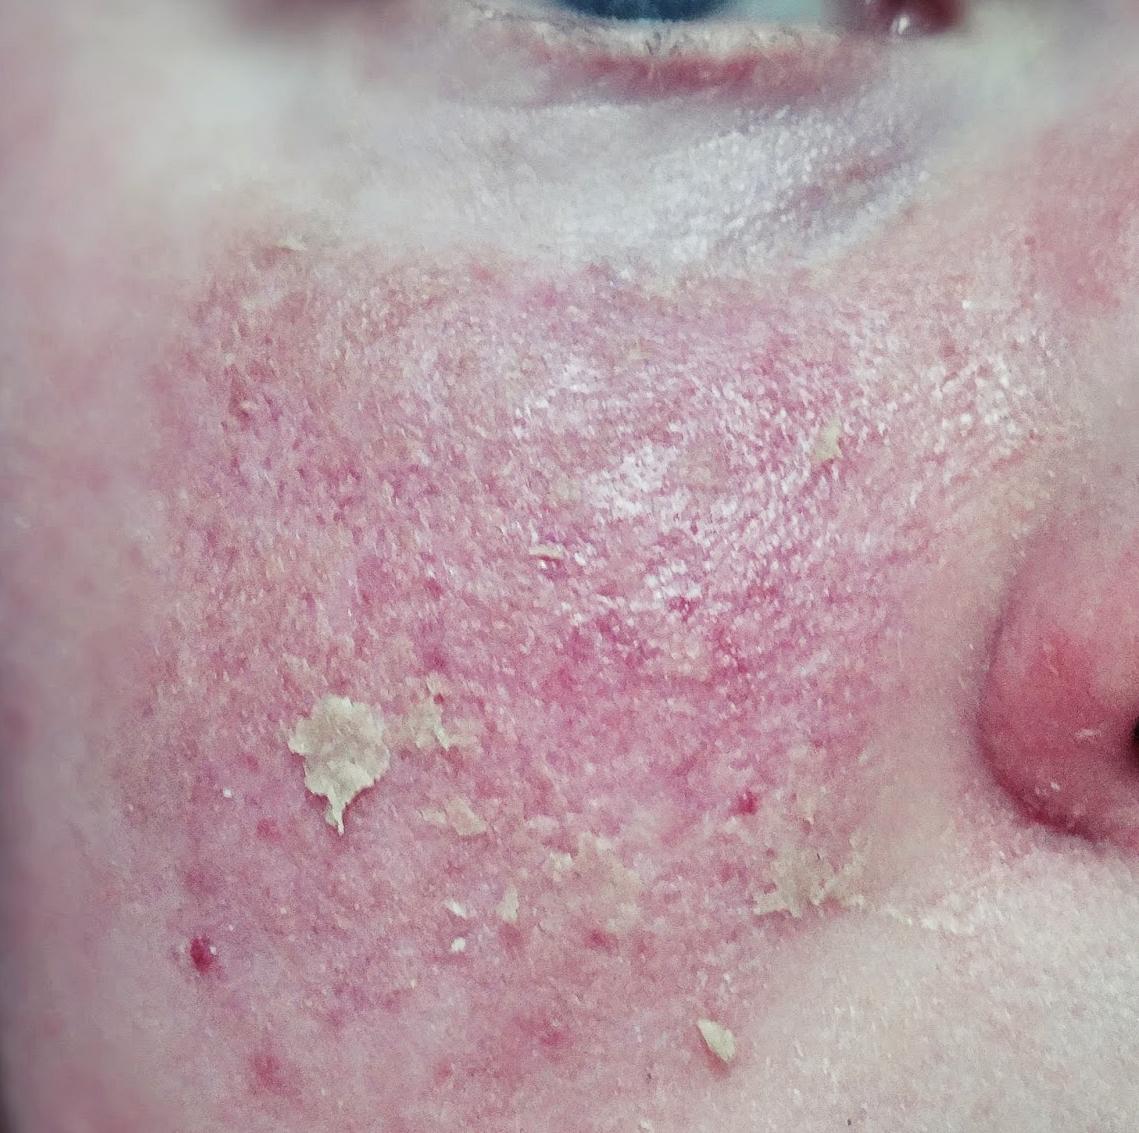 Łojotokowe zapalenie skóry | Kompendium wiedzy o Seborrheic dermatitis